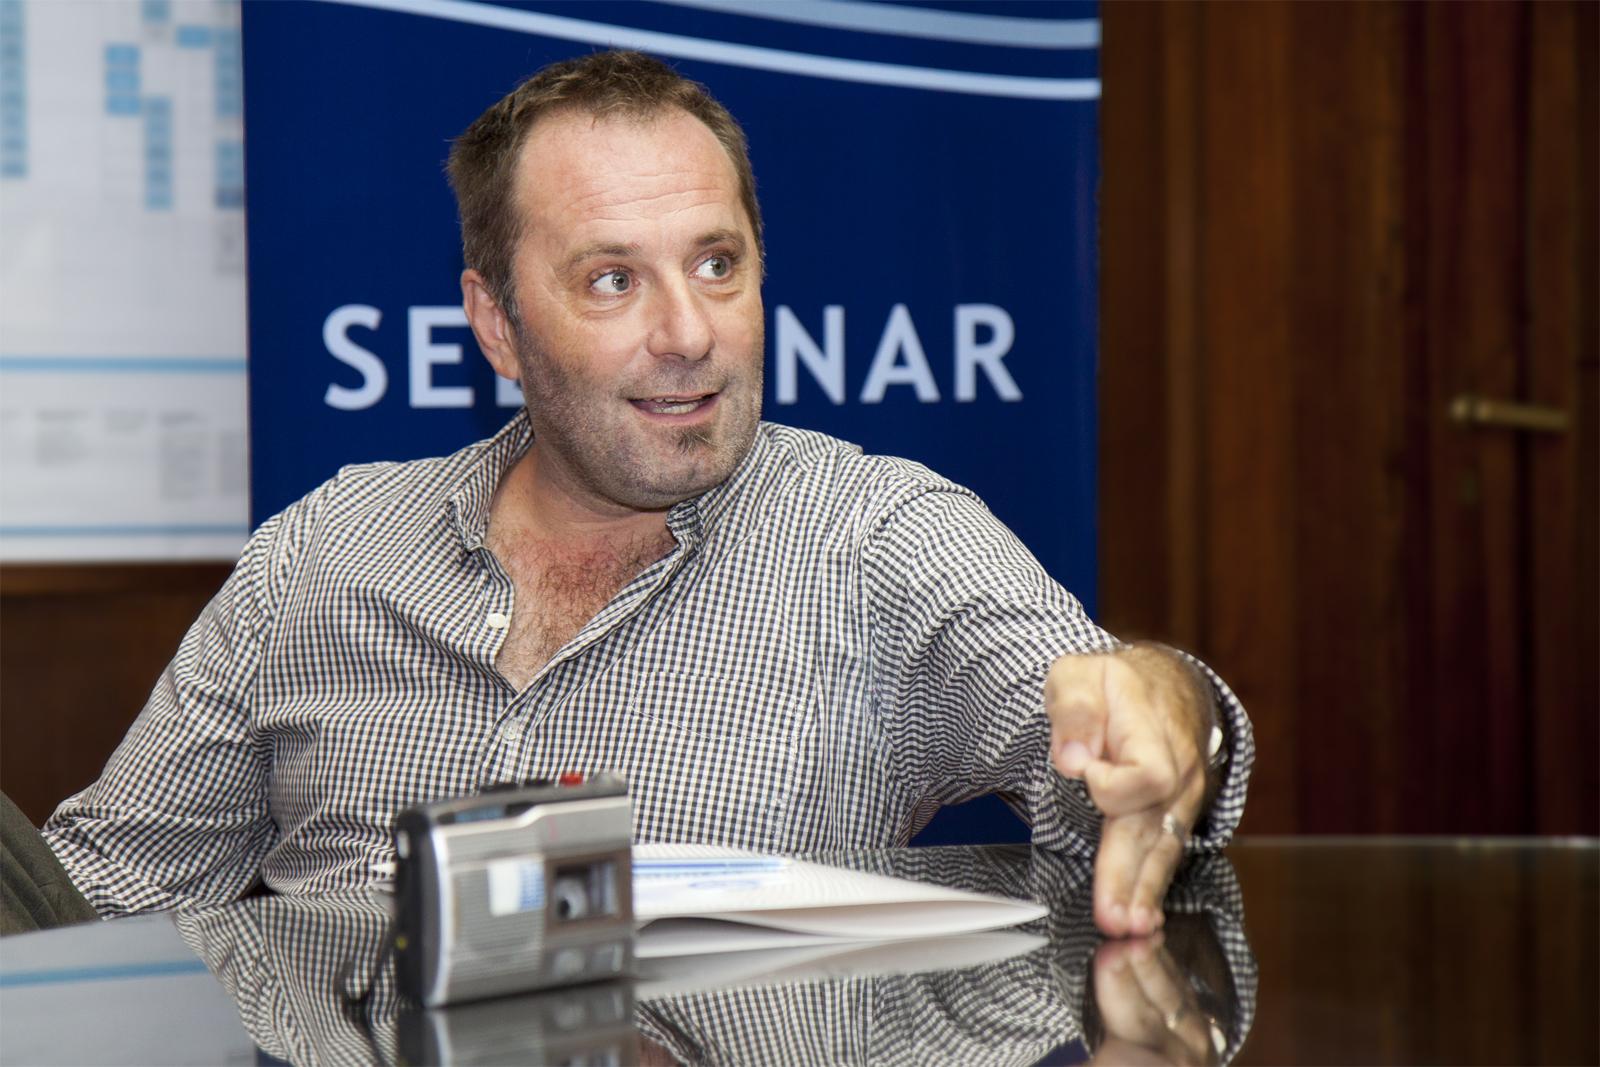 Sindicatos firmarán convenio con SEDRONAR